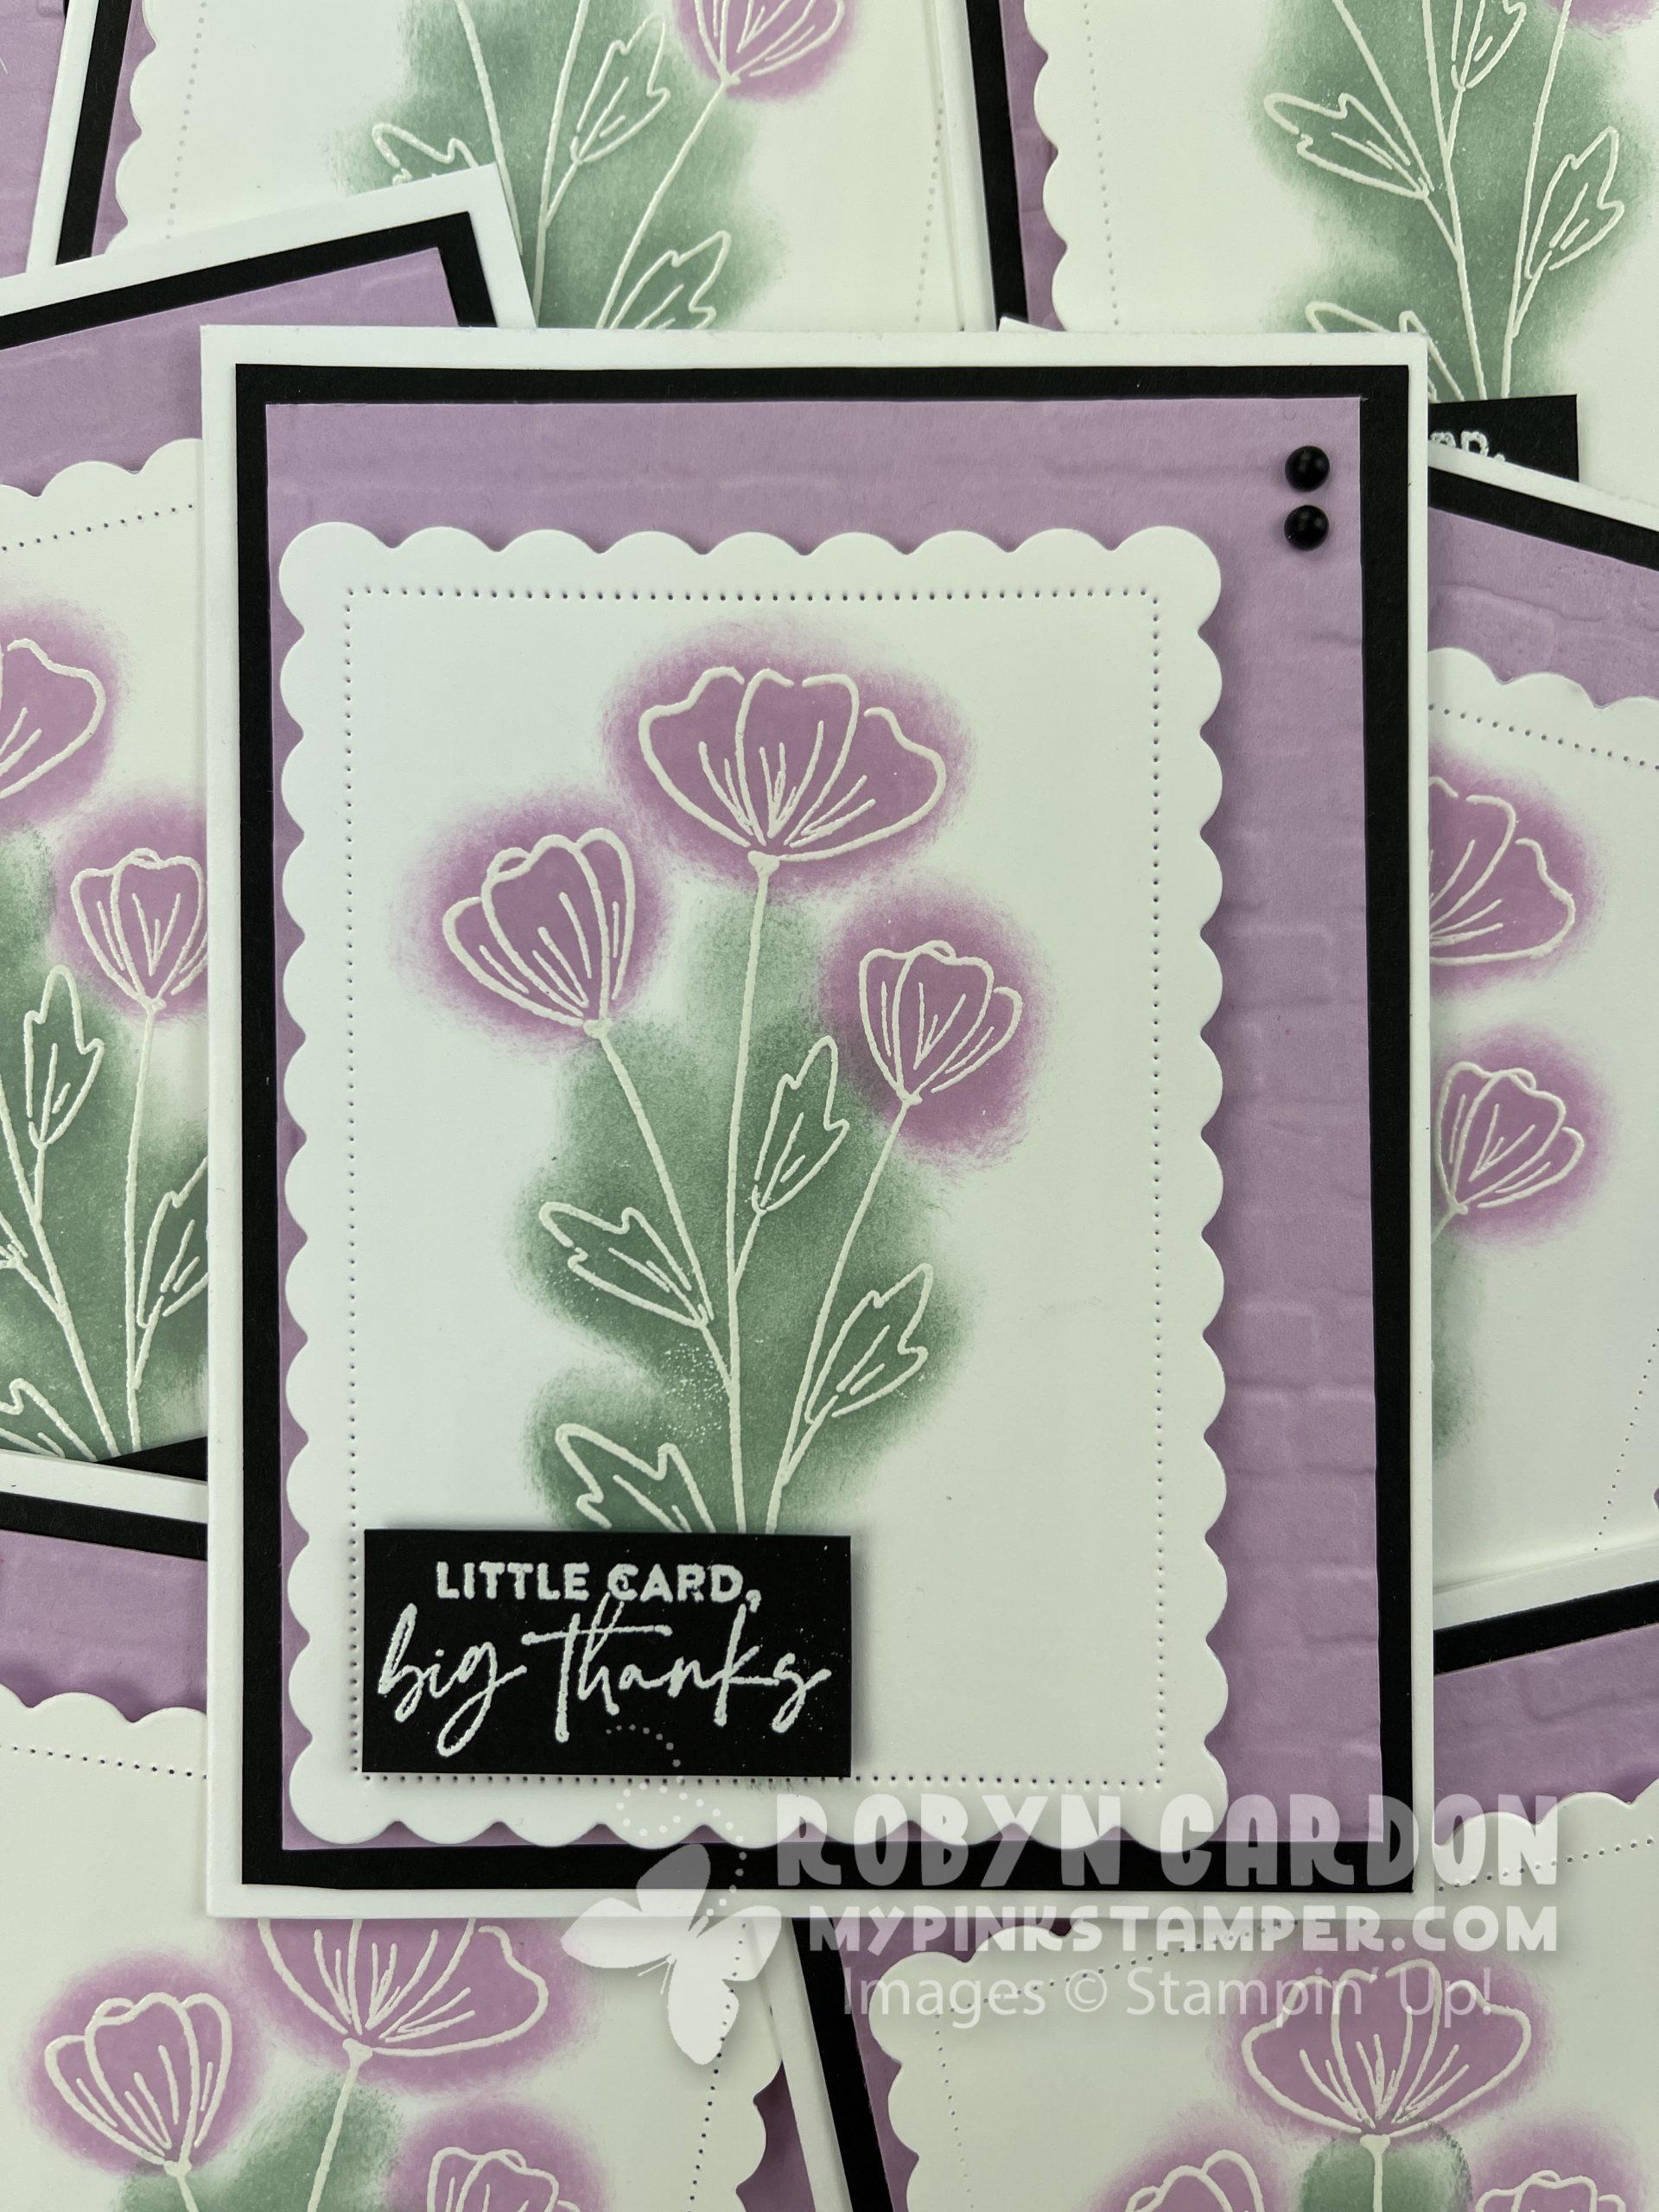 Emboss resist, stampin up flowers of friendship, video tutorial, my pink stamper